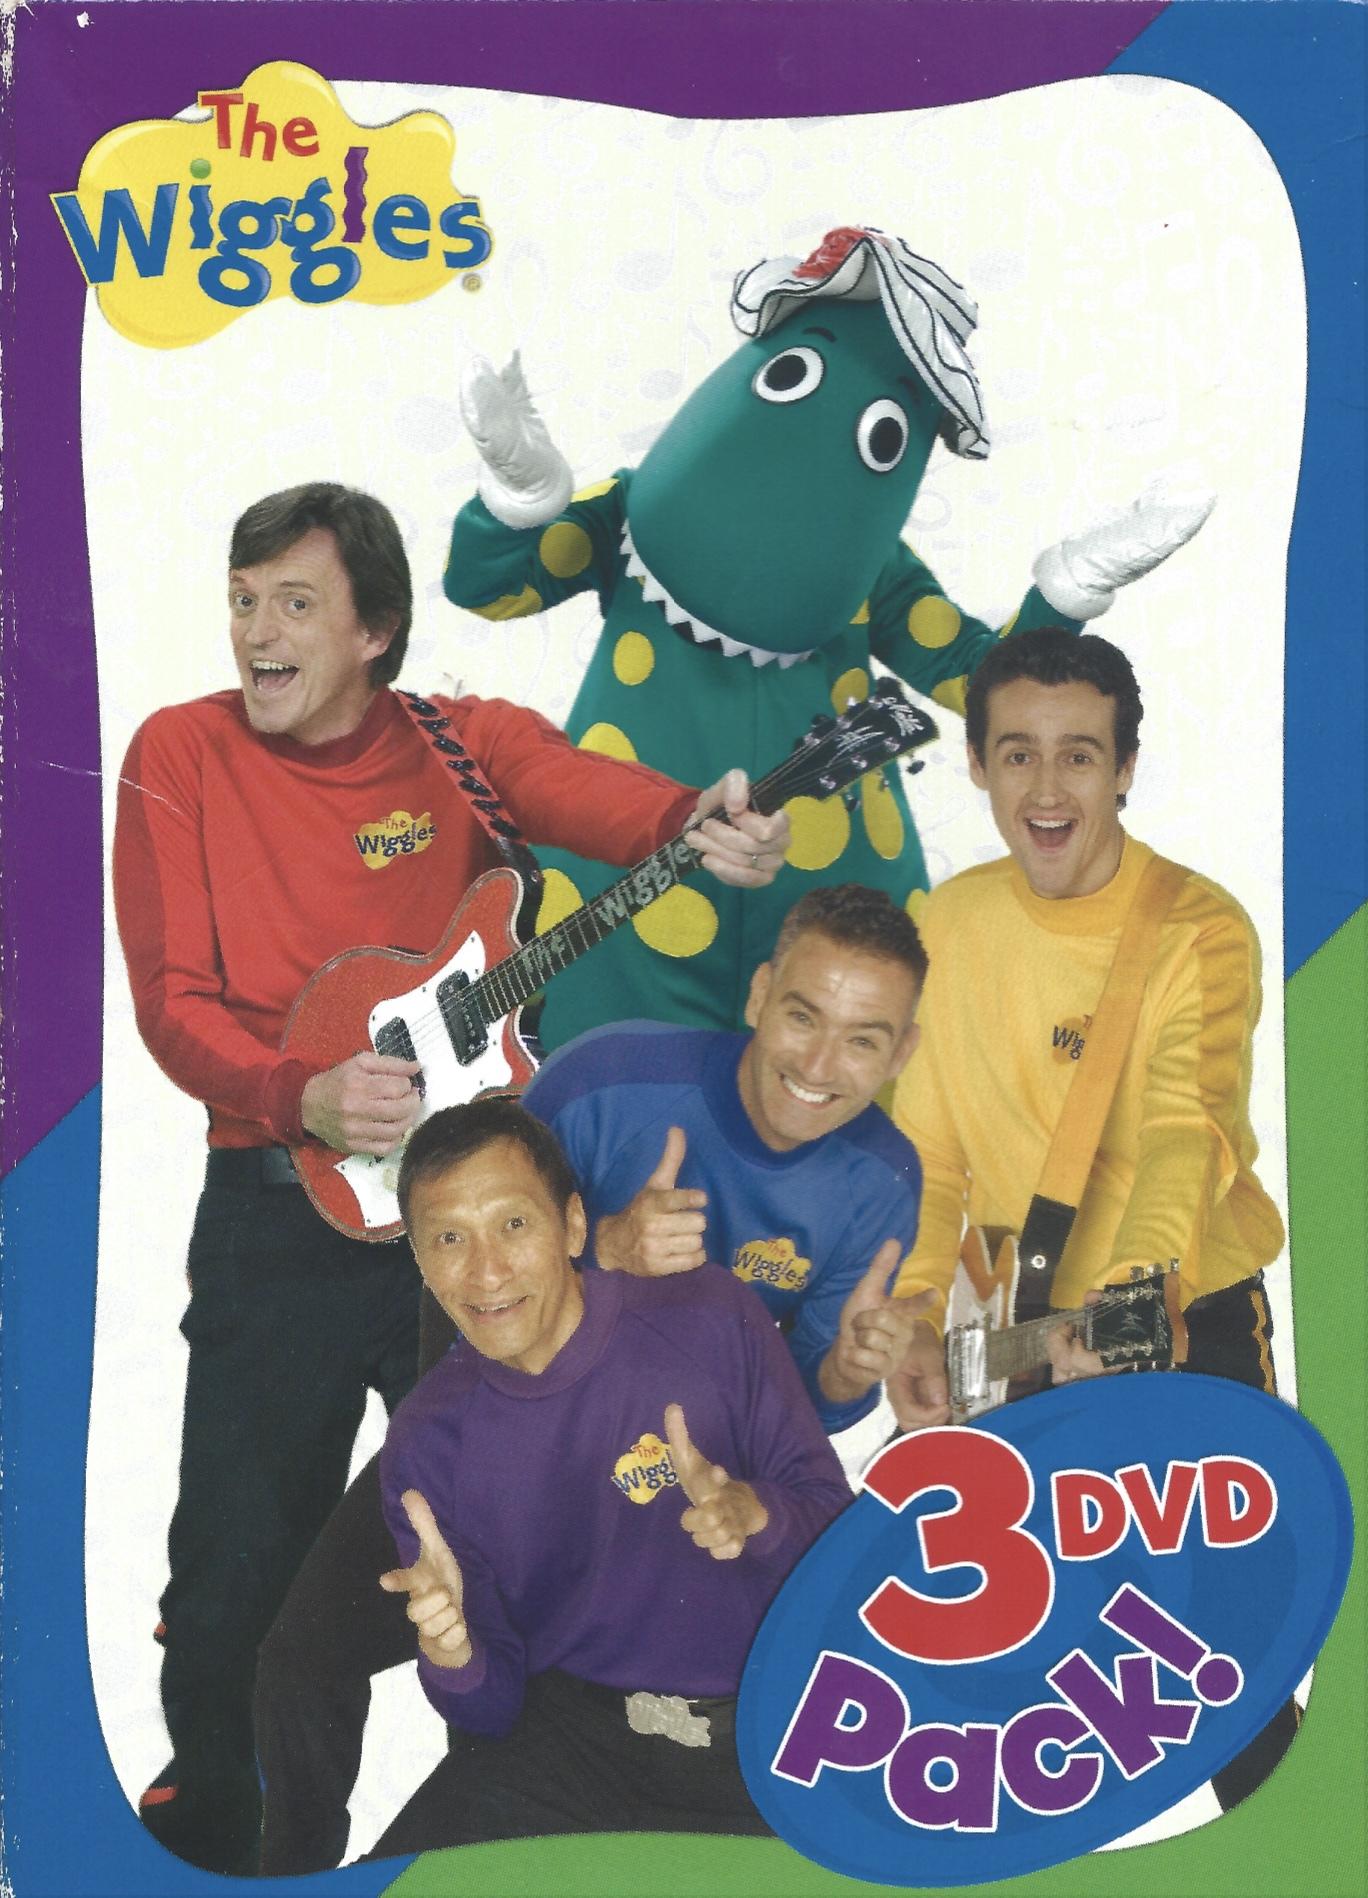 3 DVD Pack! (NCircle)